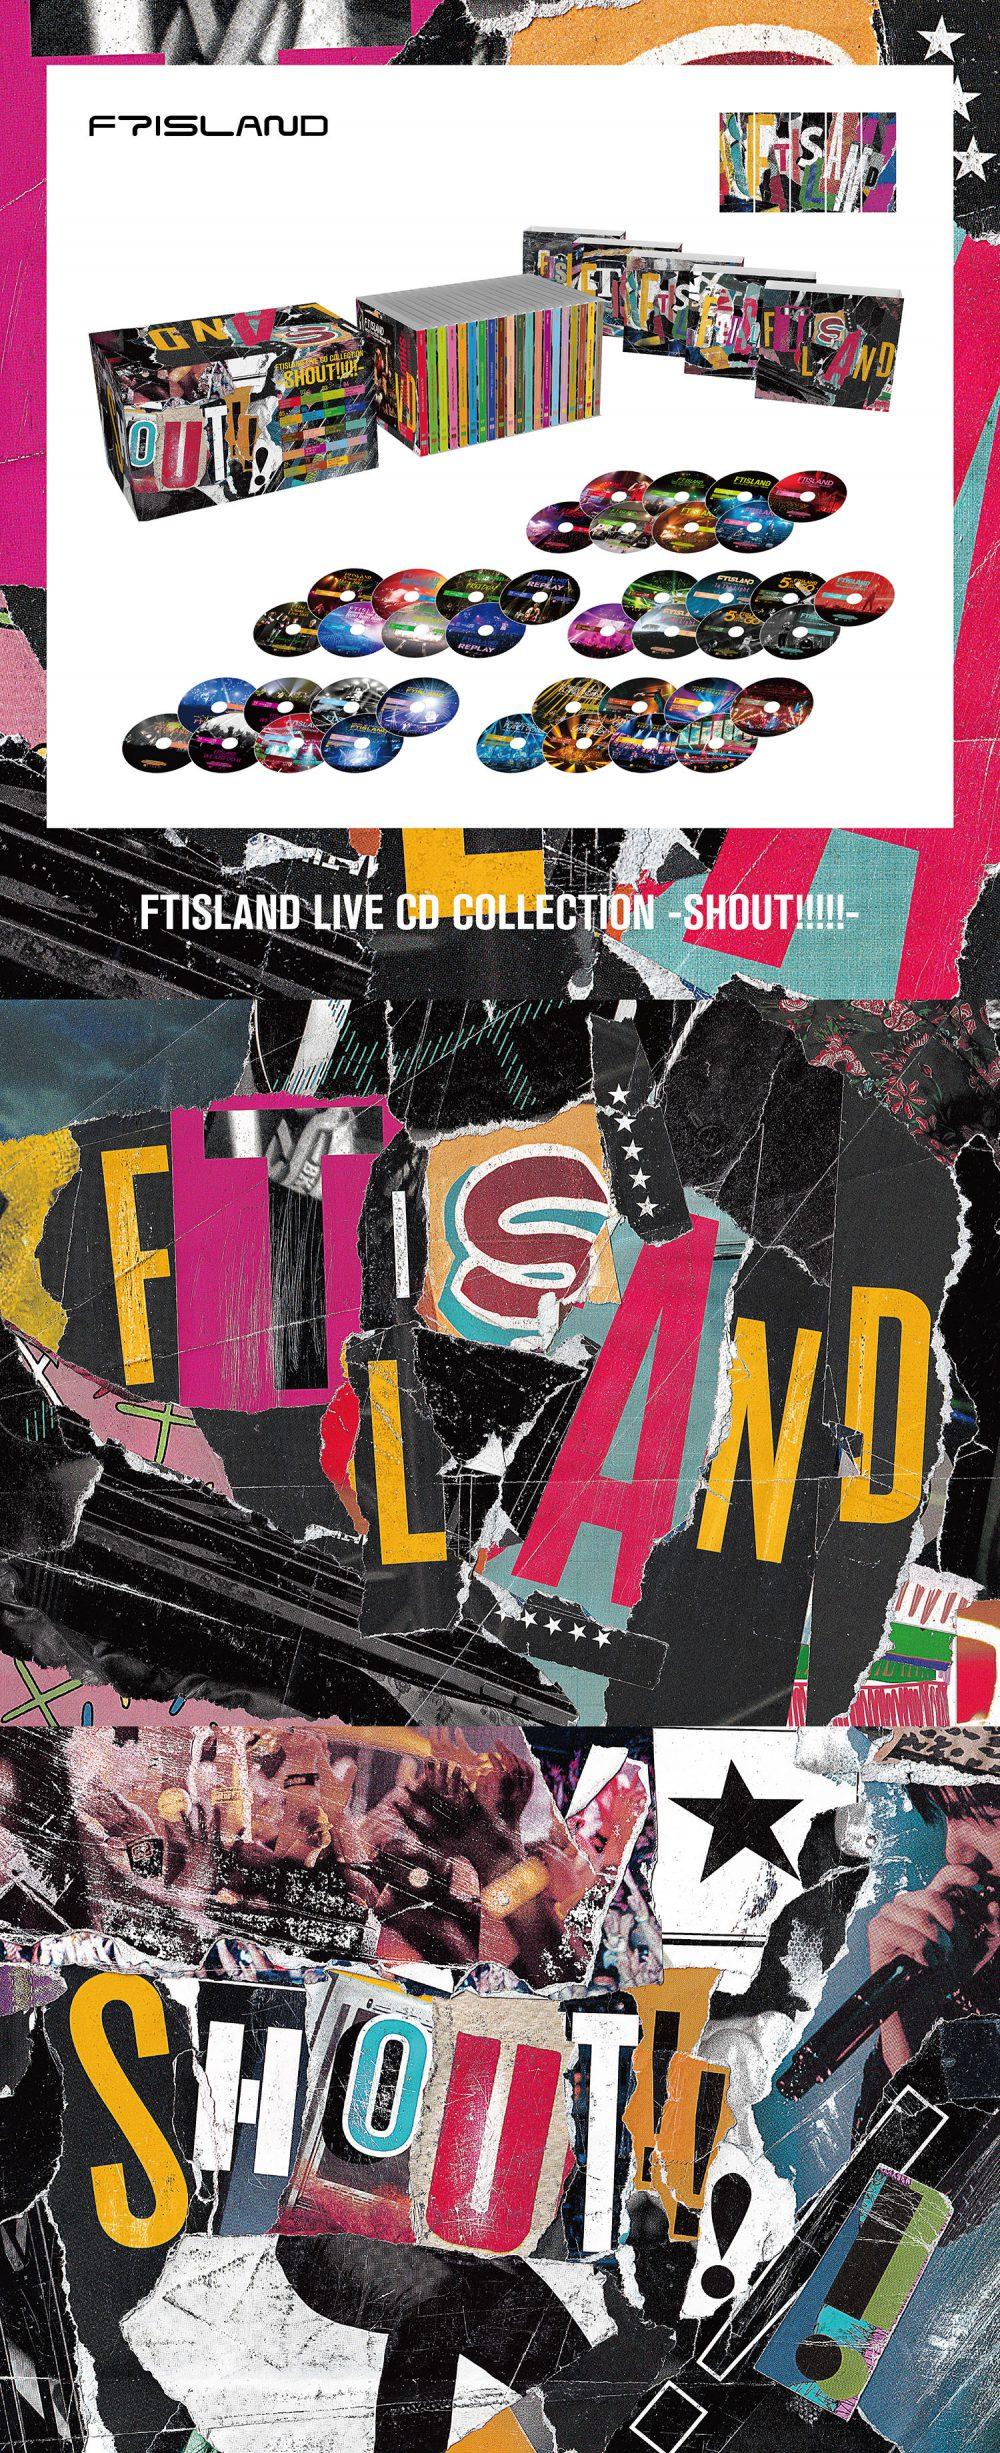 FTISLAND / LIVE CD COLLECTION -SHOUT!!!!!-